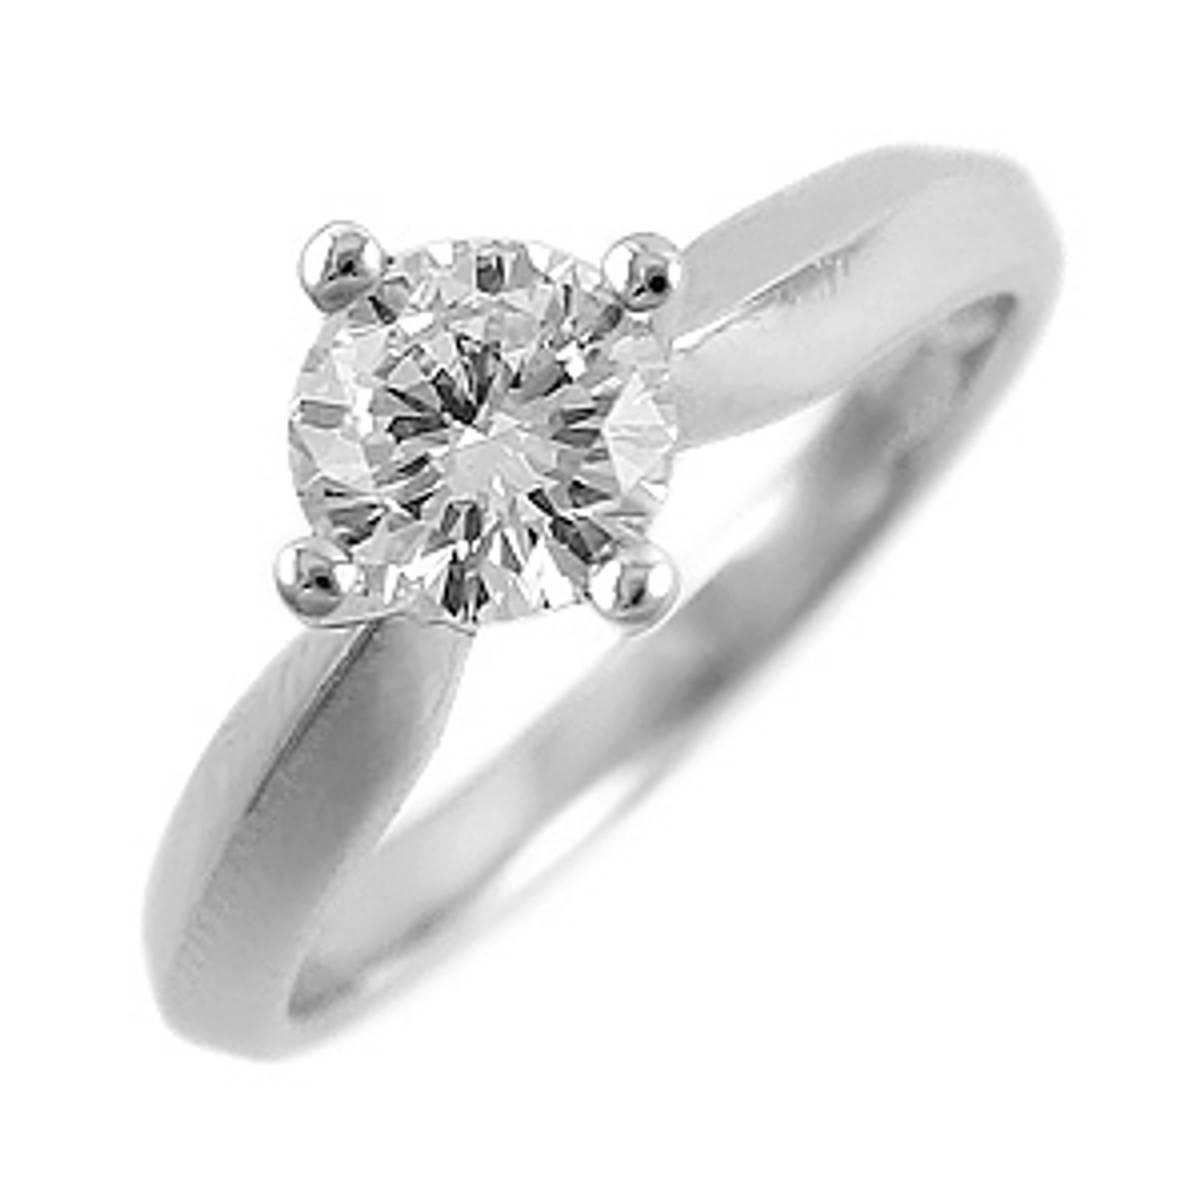 Irish made 0.50ct brilliant cut solitaire diamond engagement ring set in 18ct white gold.Colour: H/IClarity VSI